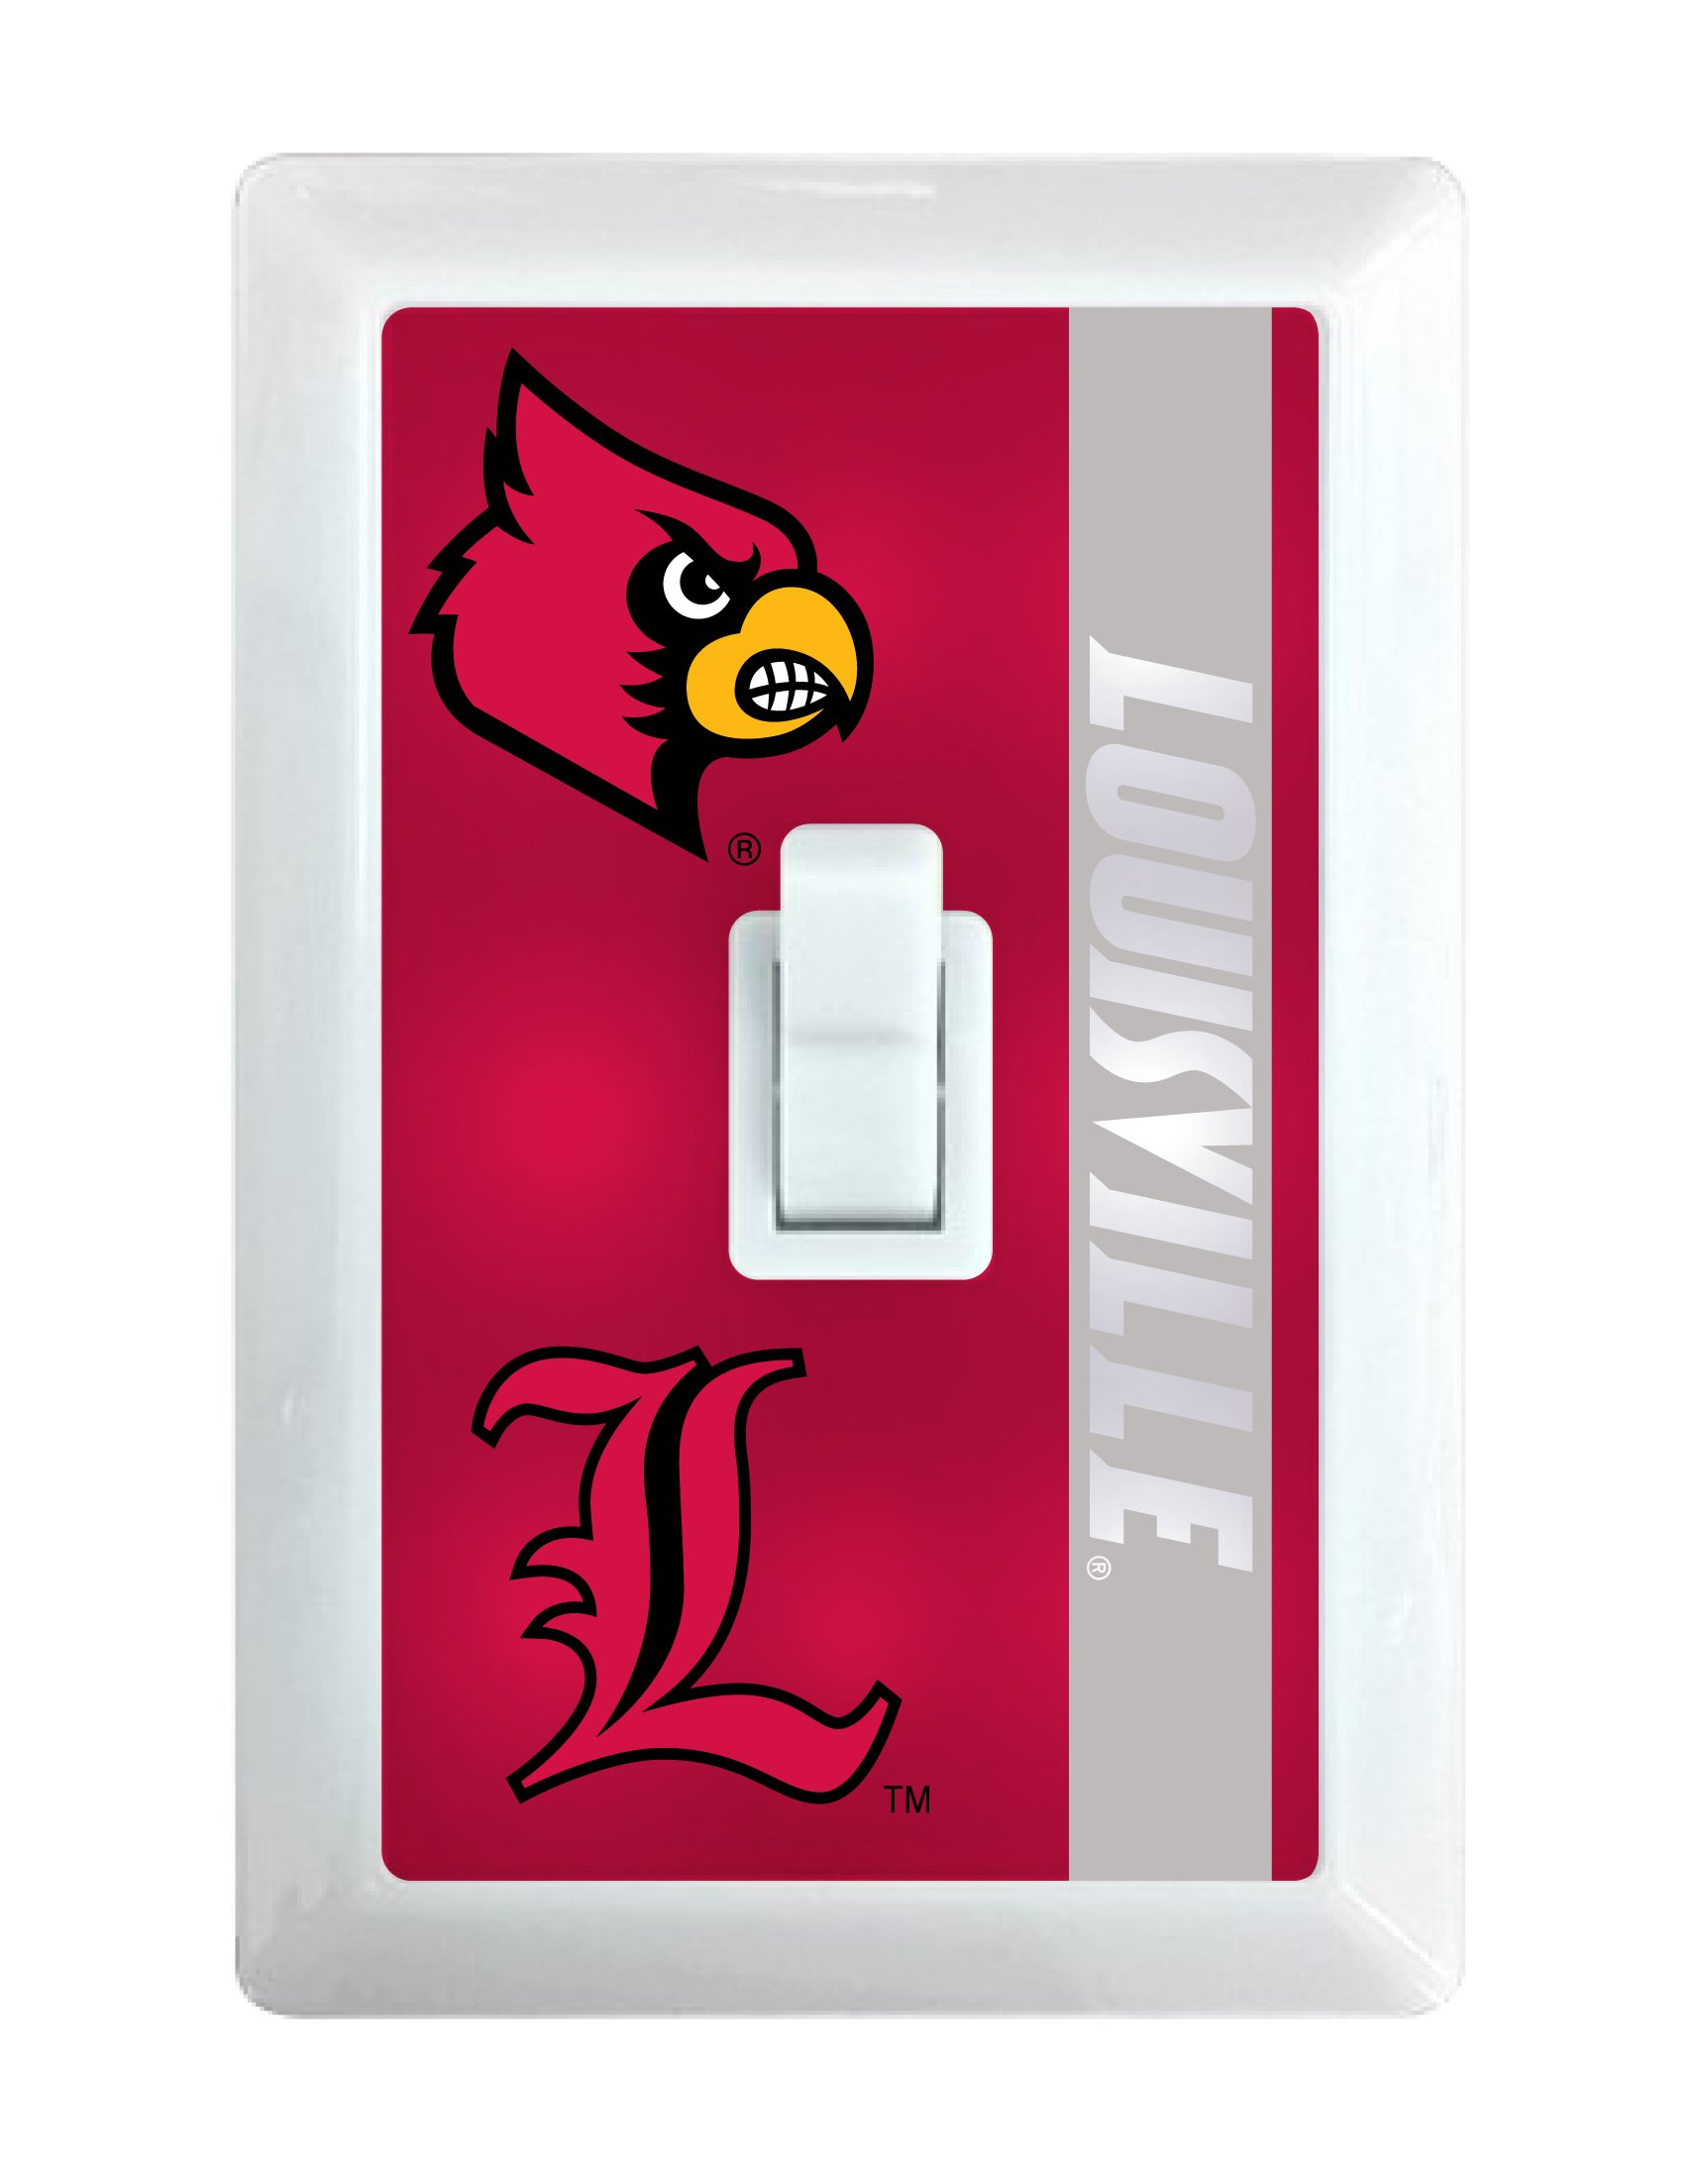 Louisville Cardinals LED Light switch